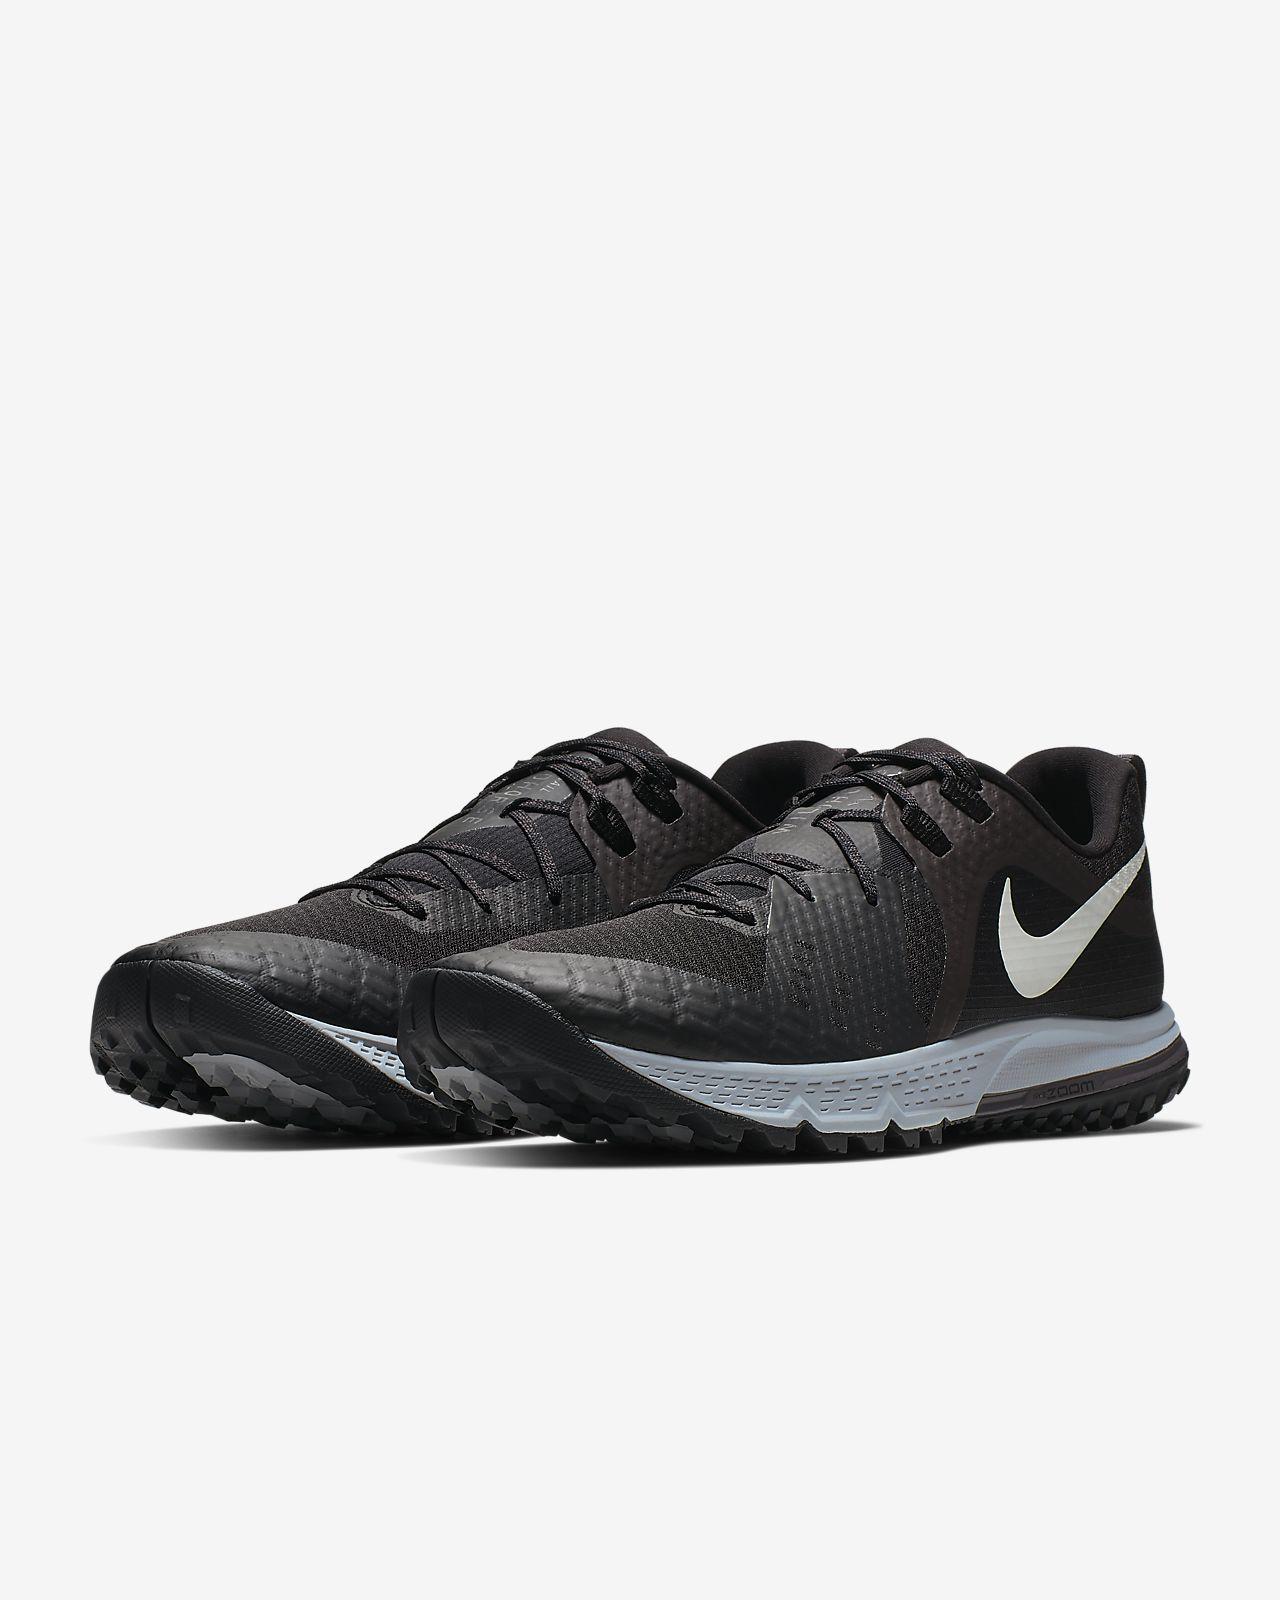 Nike Air Zoom Wildhorse 5 Men's Trail Running Shoe